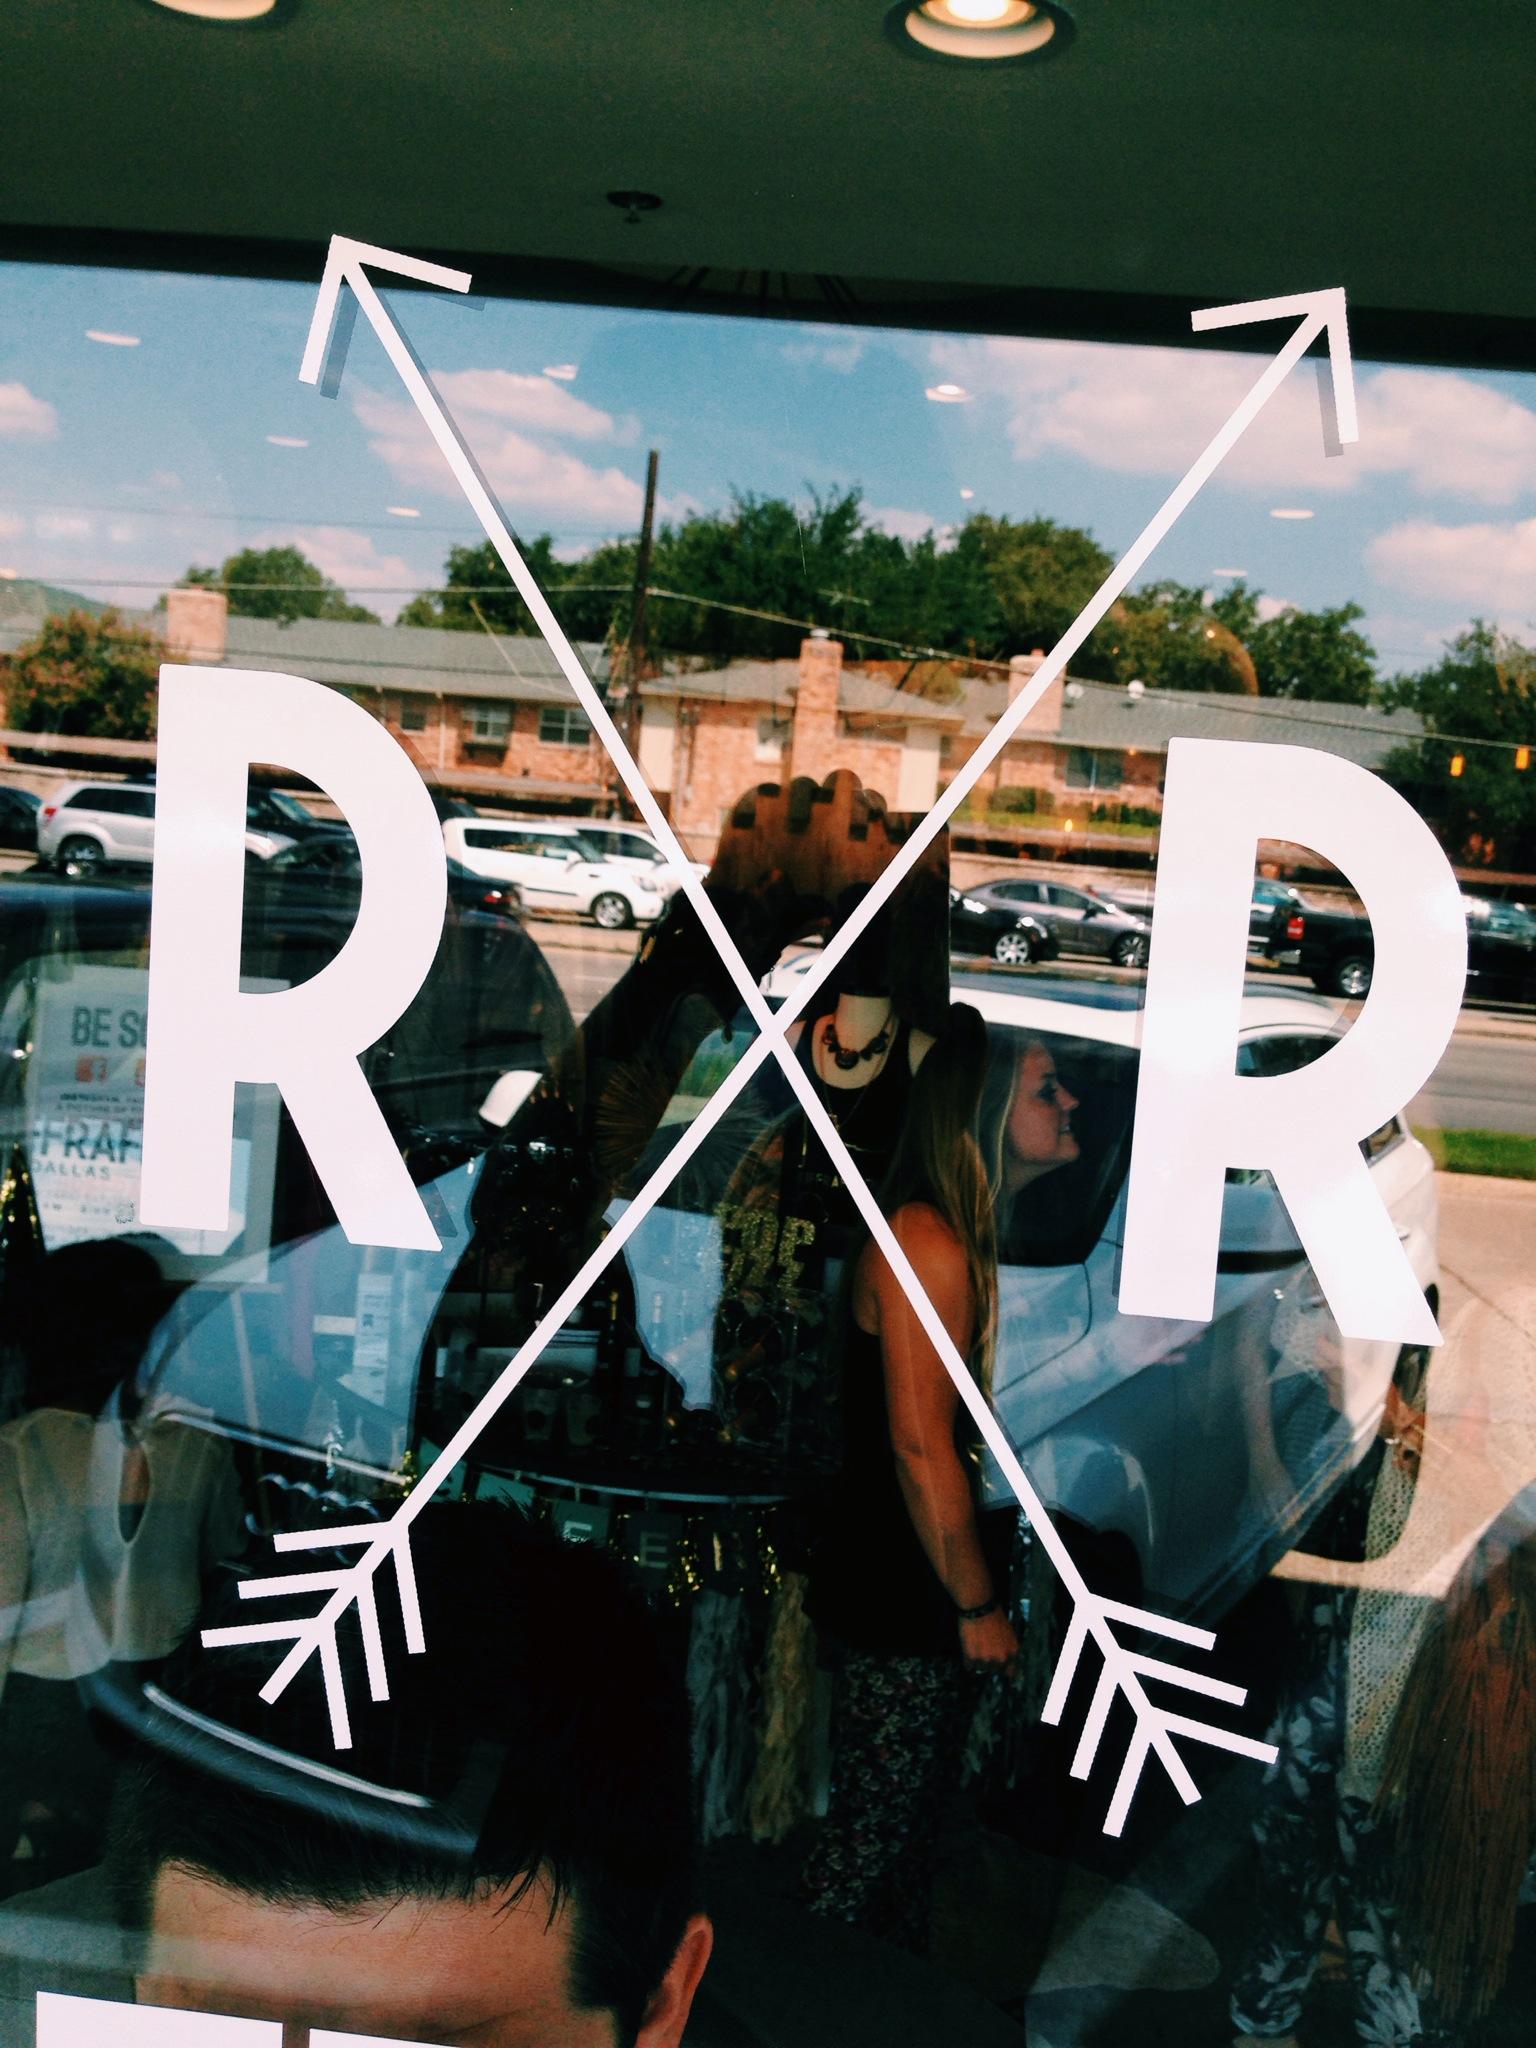 Riffraff Dallas Window Clings